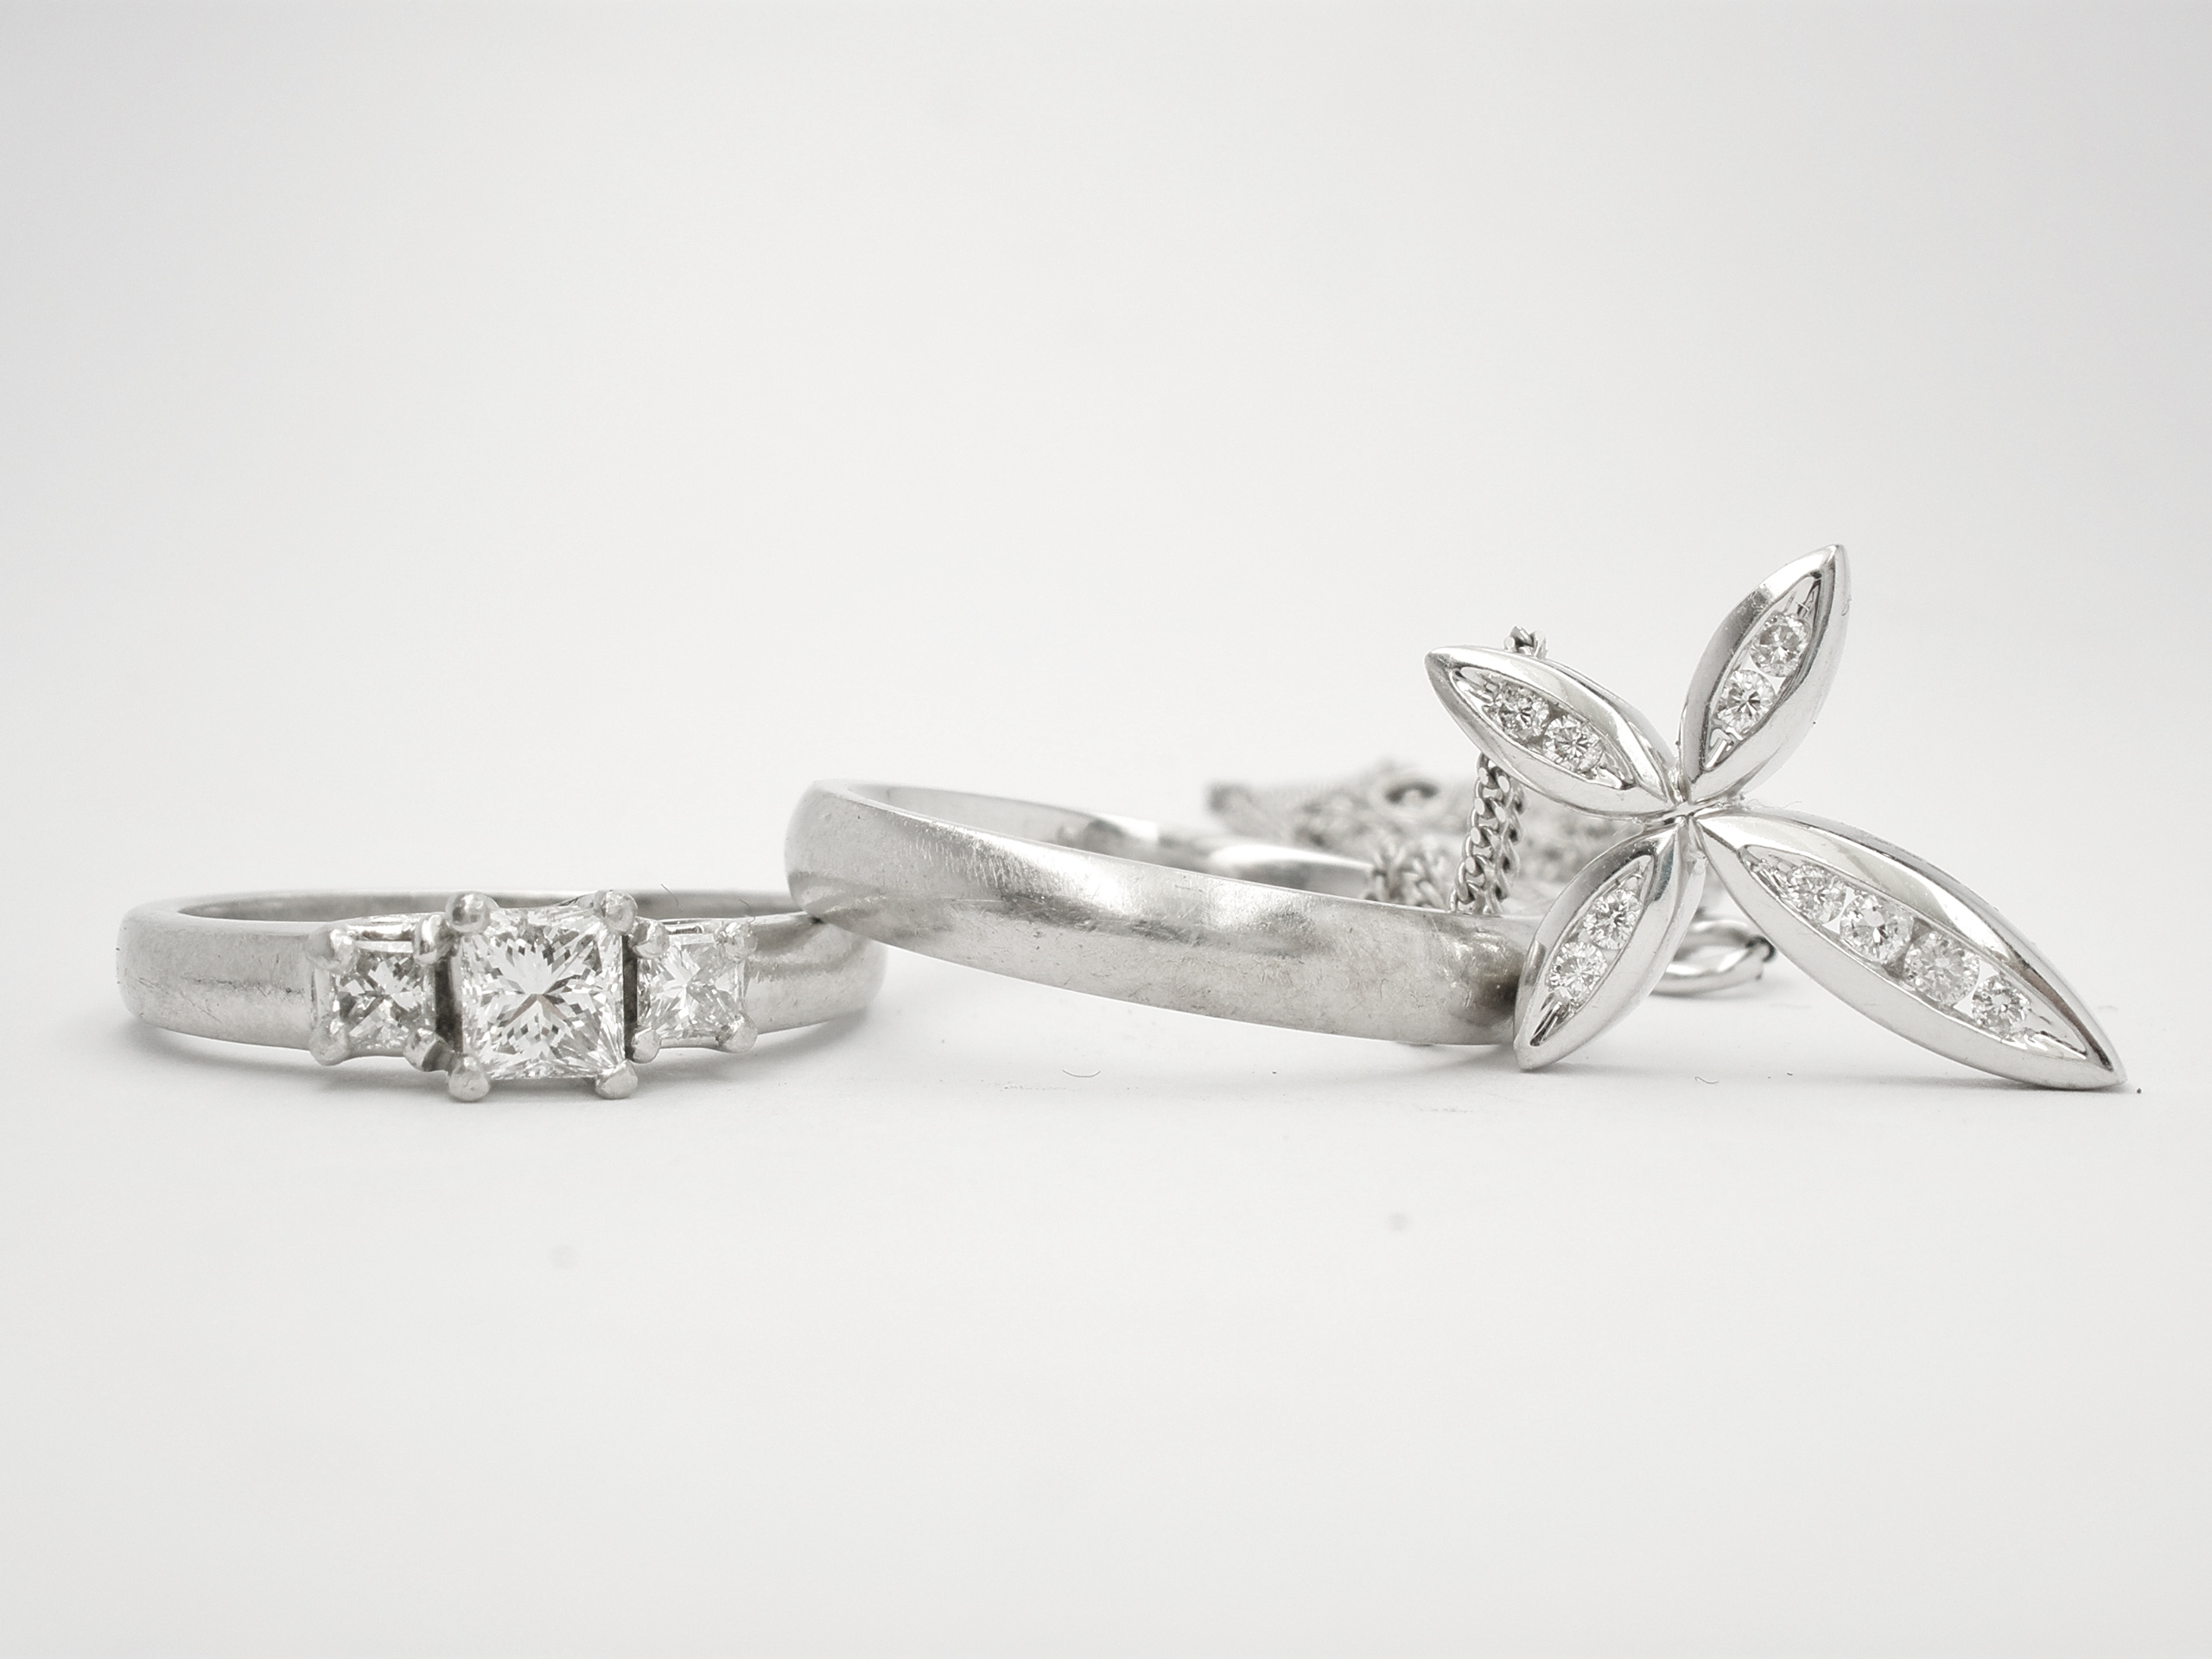 3 stone diamond princess cut ring, diamond set cross & plain platinum wedding ring to remount using platinum wedding ring into 1 ring.